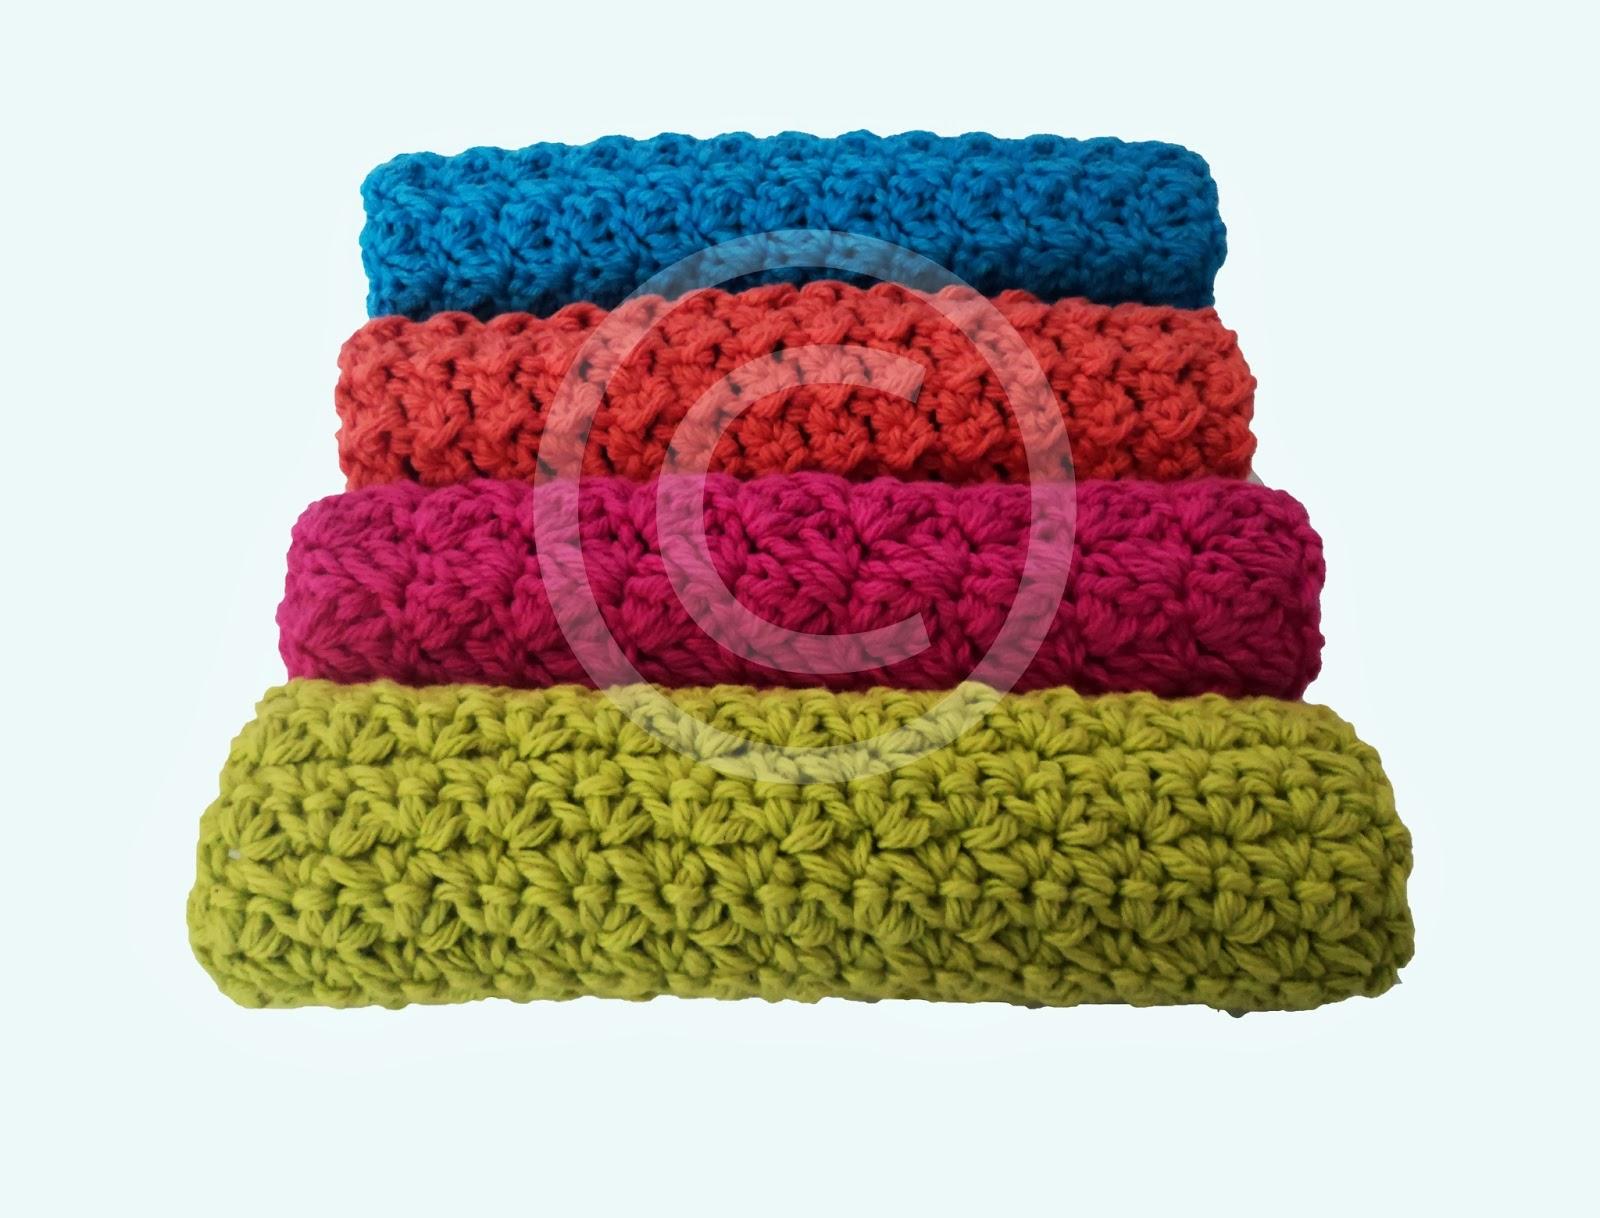 Cute Little Crafts: Crochet Pattern: Textured Washcloths